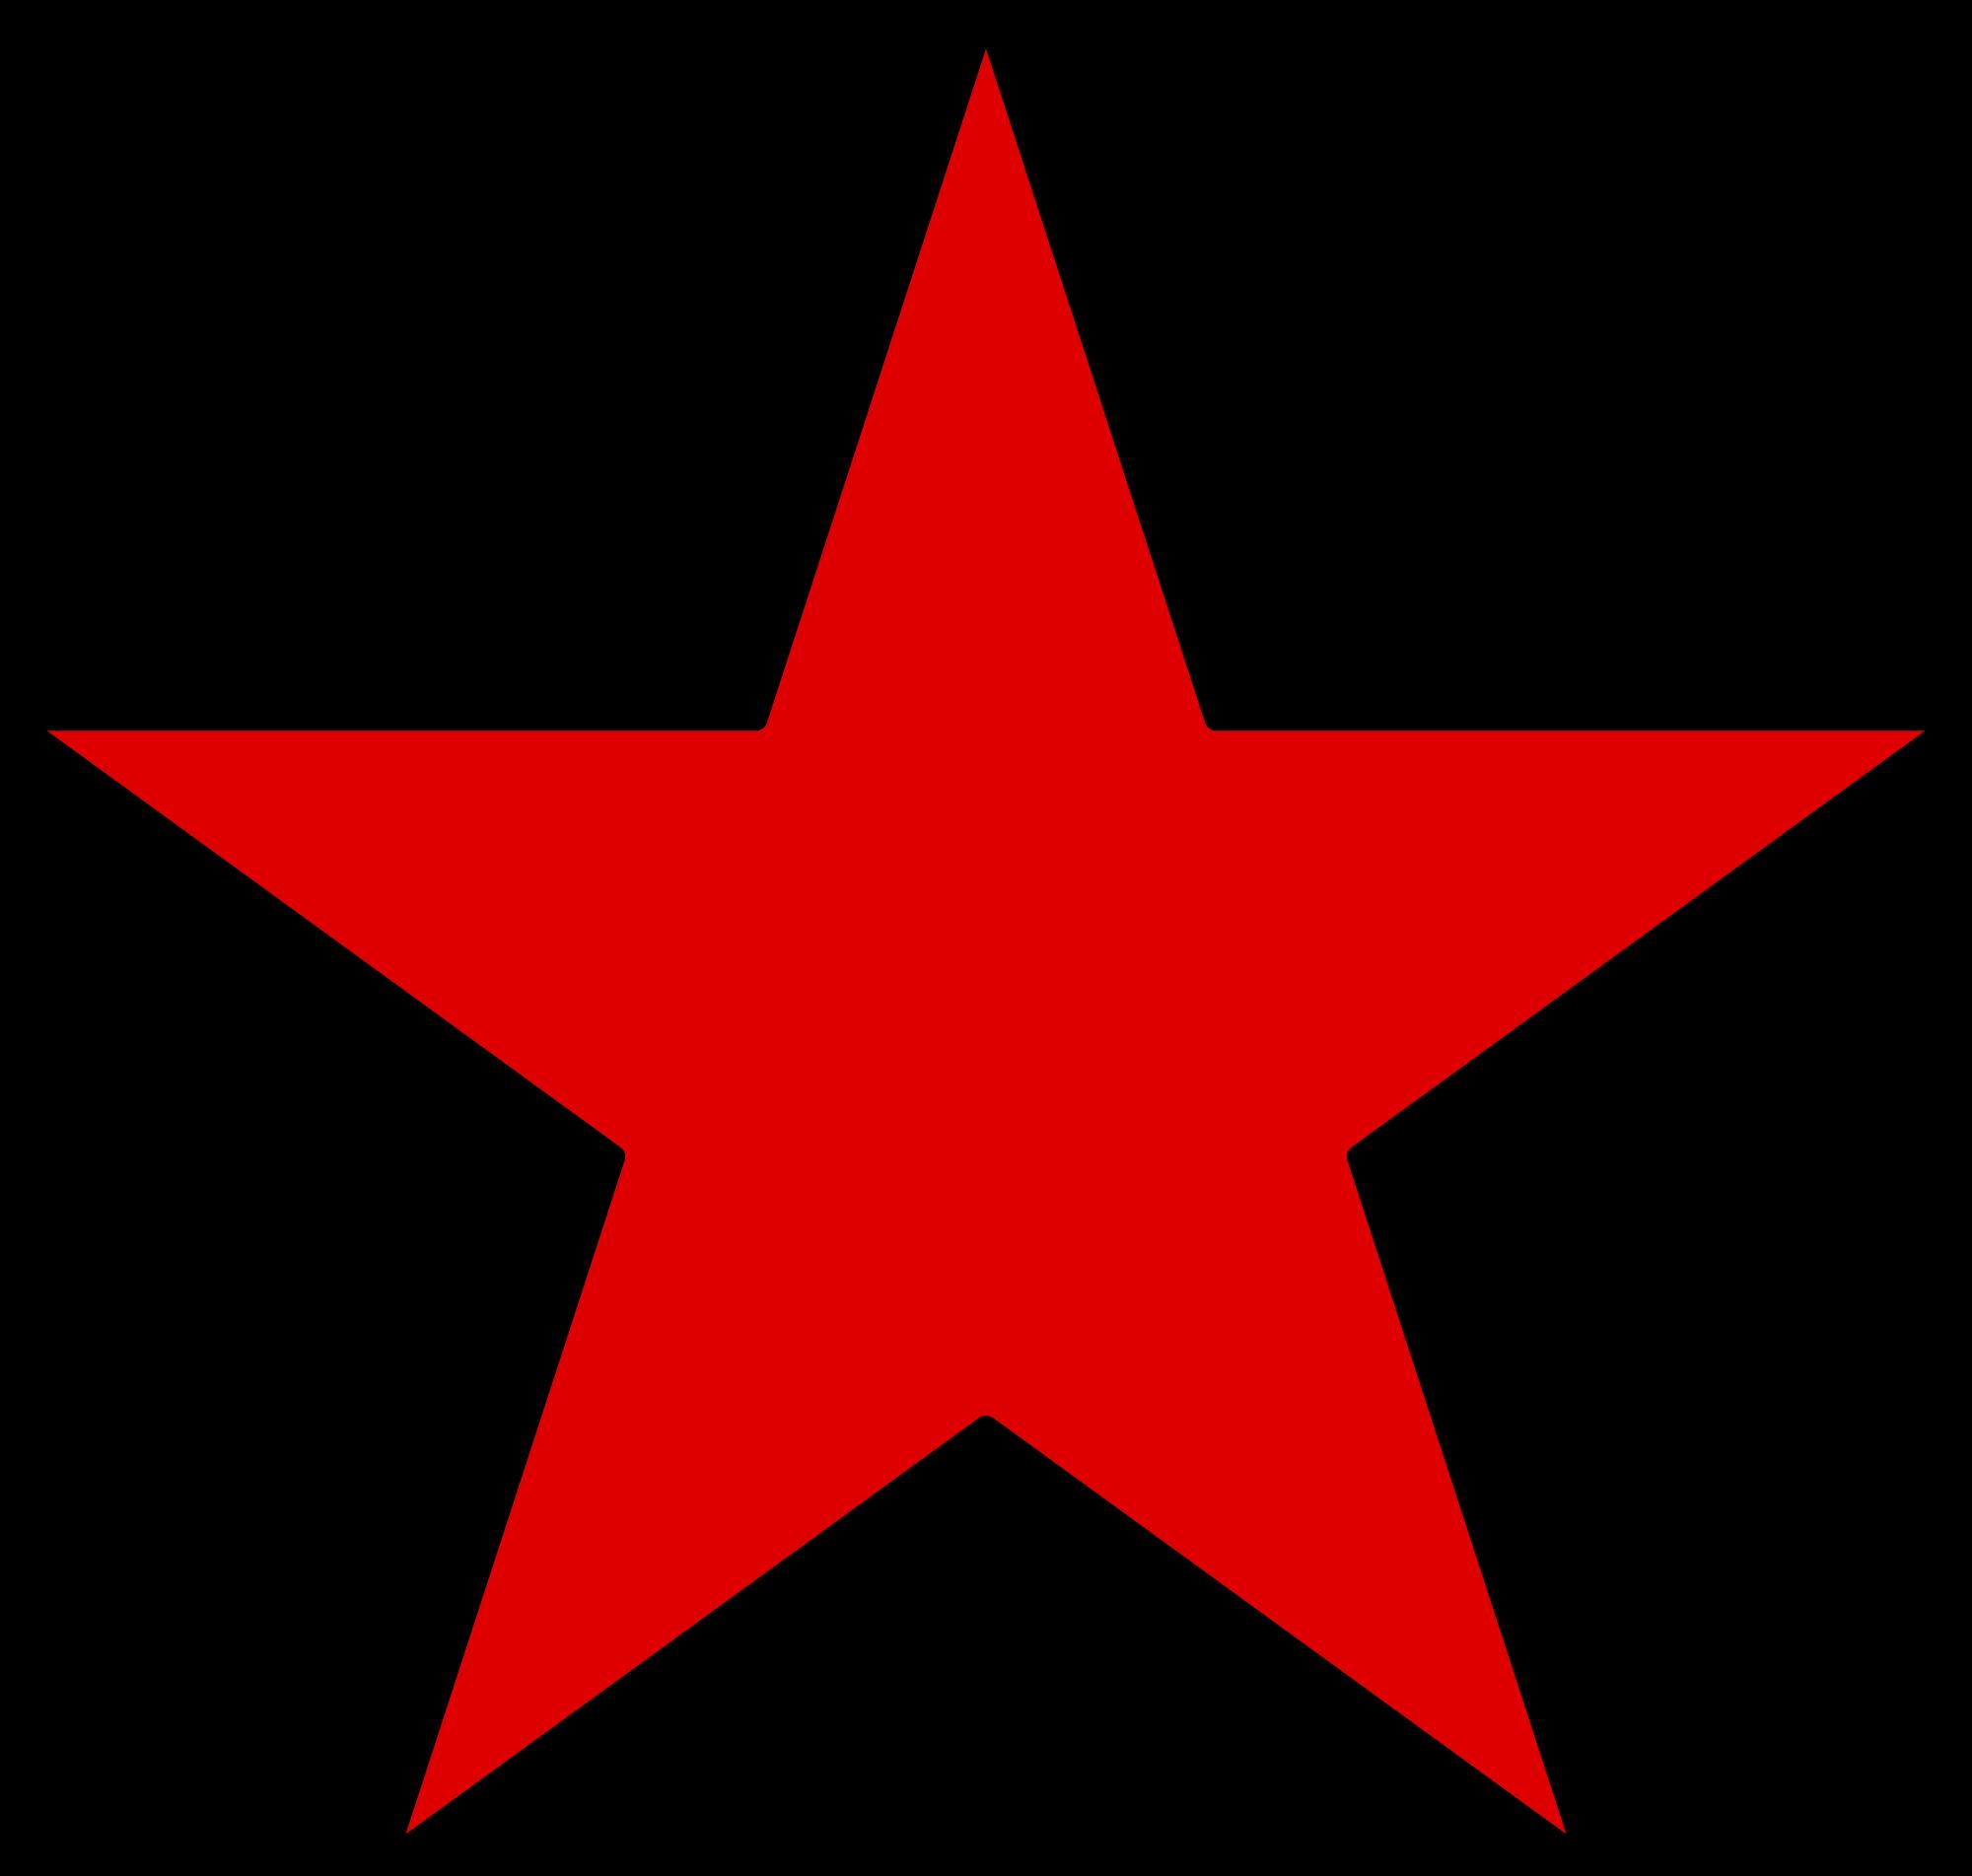 2000x1903 White Star Transparent Background